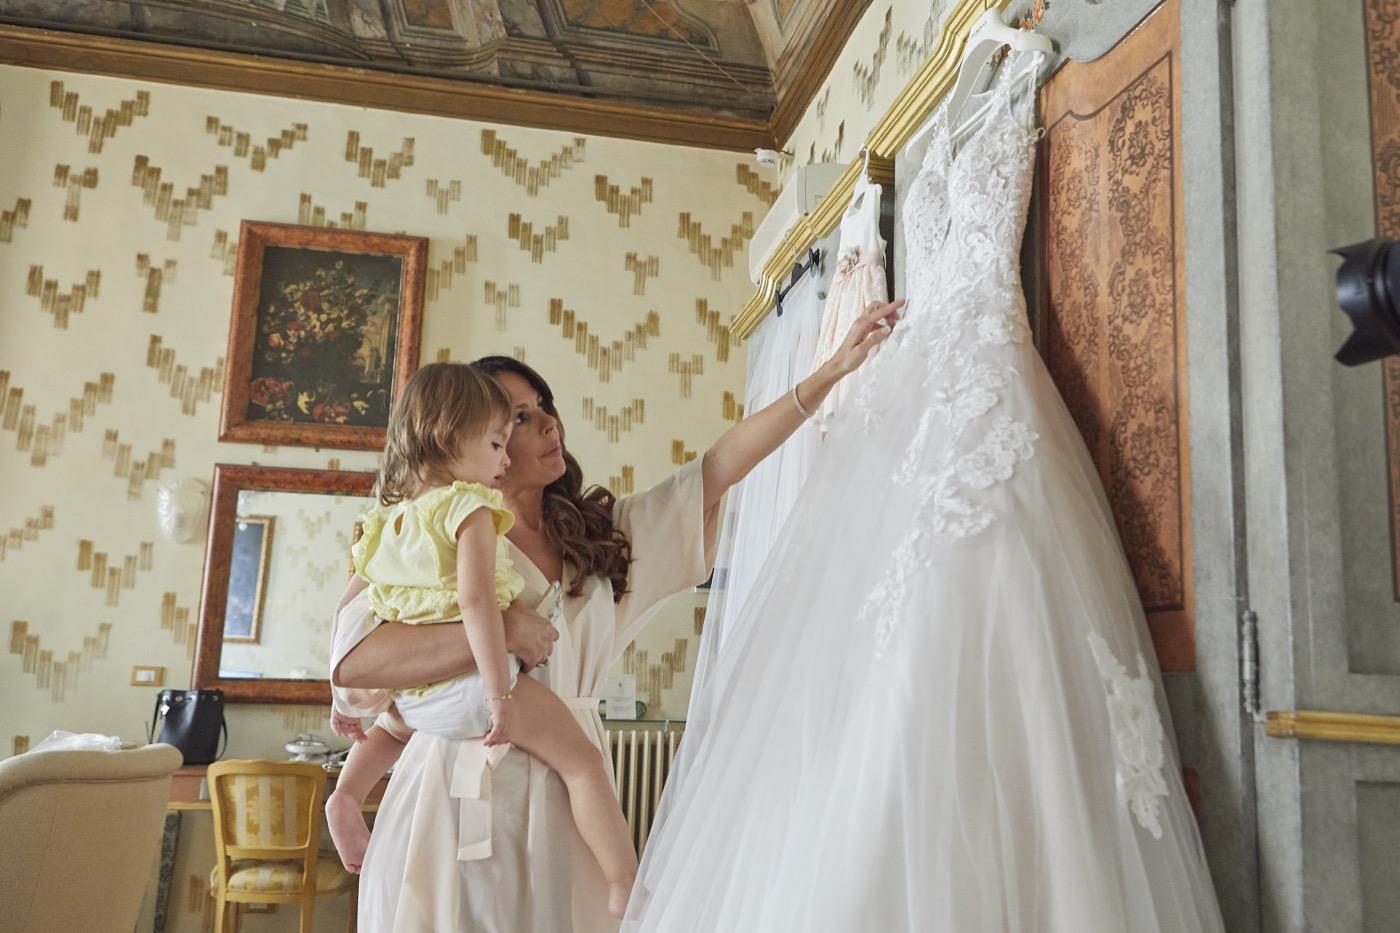 Claudio-Coppola-wedding-photographer-la-scuderia-eventi-preparativi-la-rosetta-perugia-17